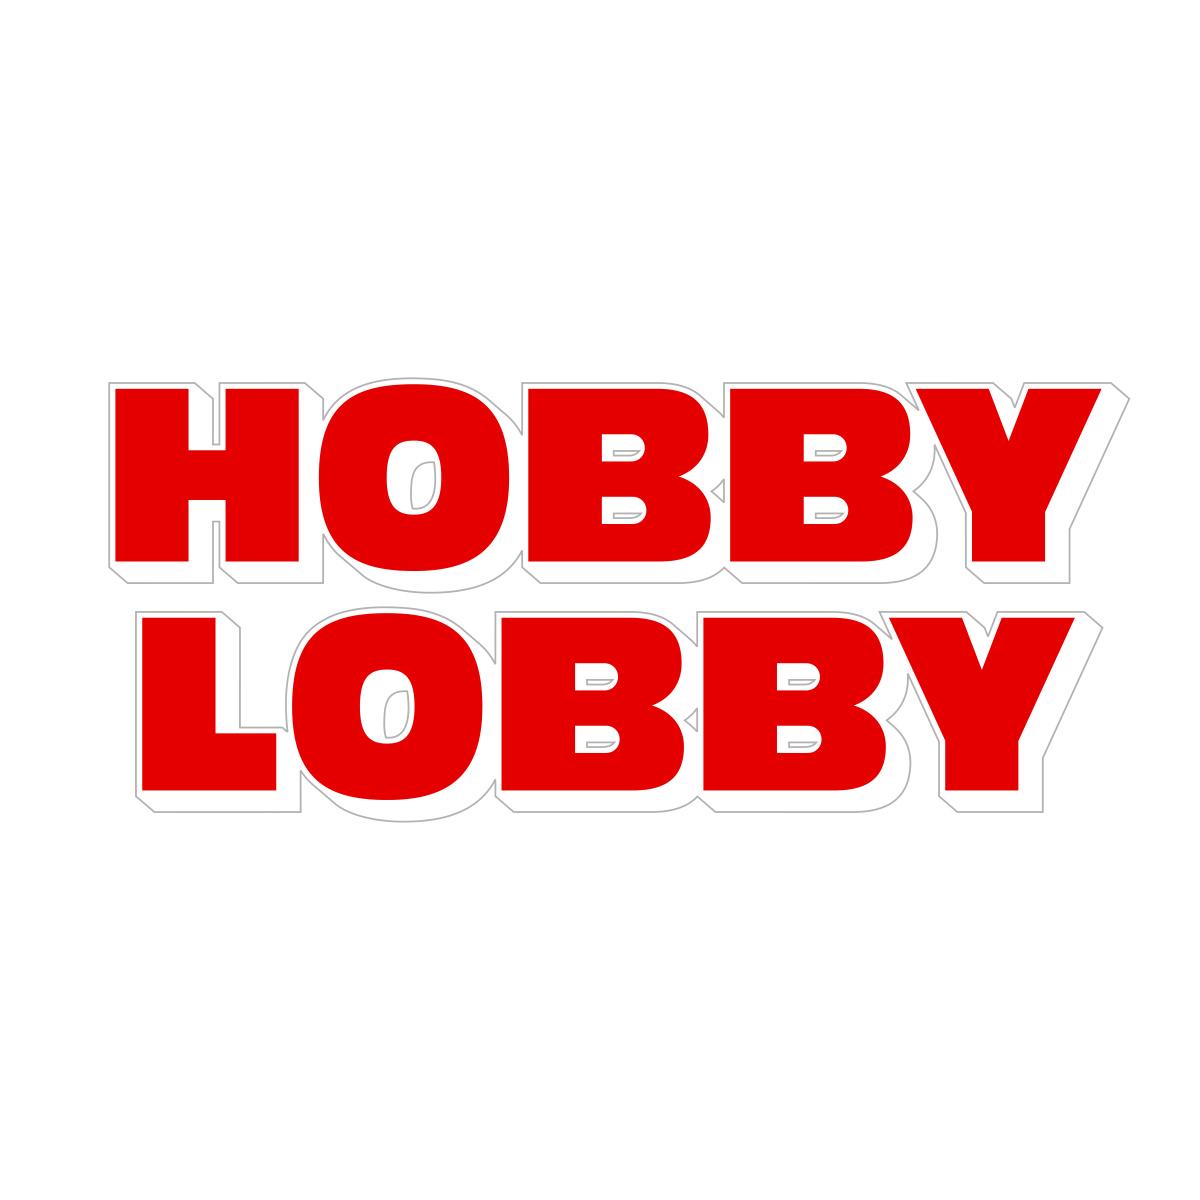 https://secureservercdn.net/45.40.150.47/08r.a40.myftpupload.com/wp-content/uploads/2019/04/Hobby-Lobby.jpg